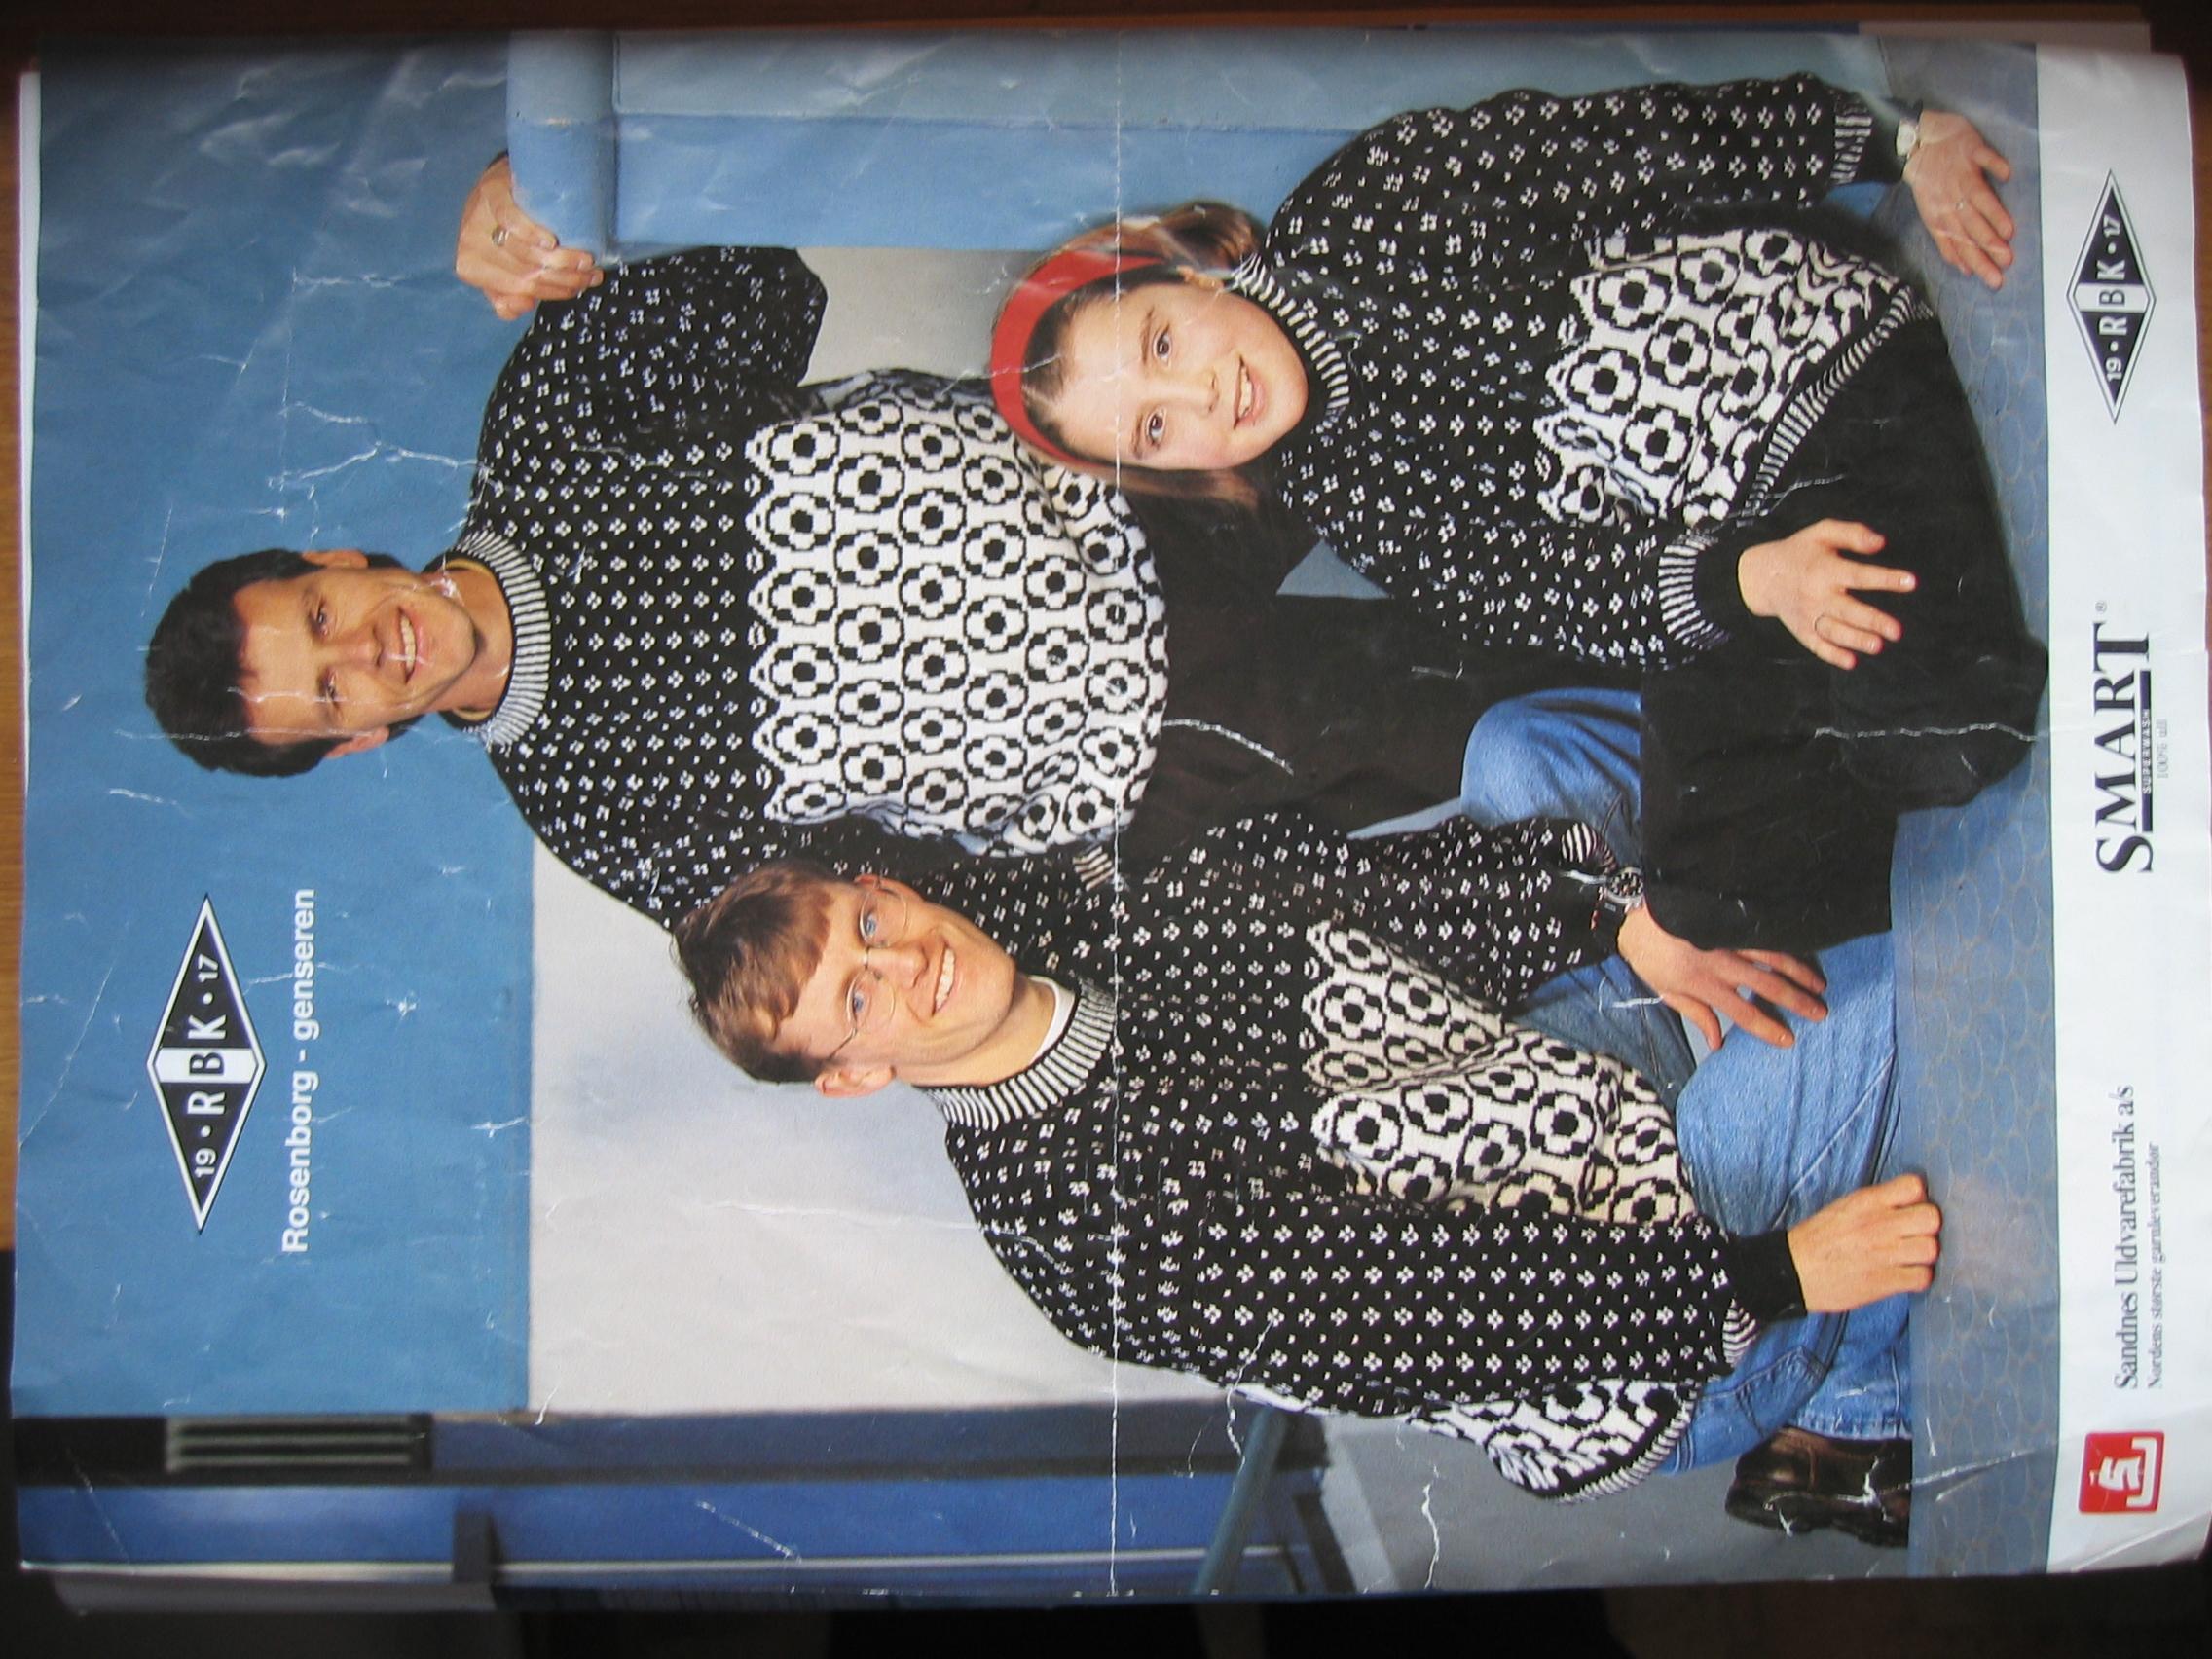 rbk genser mønster